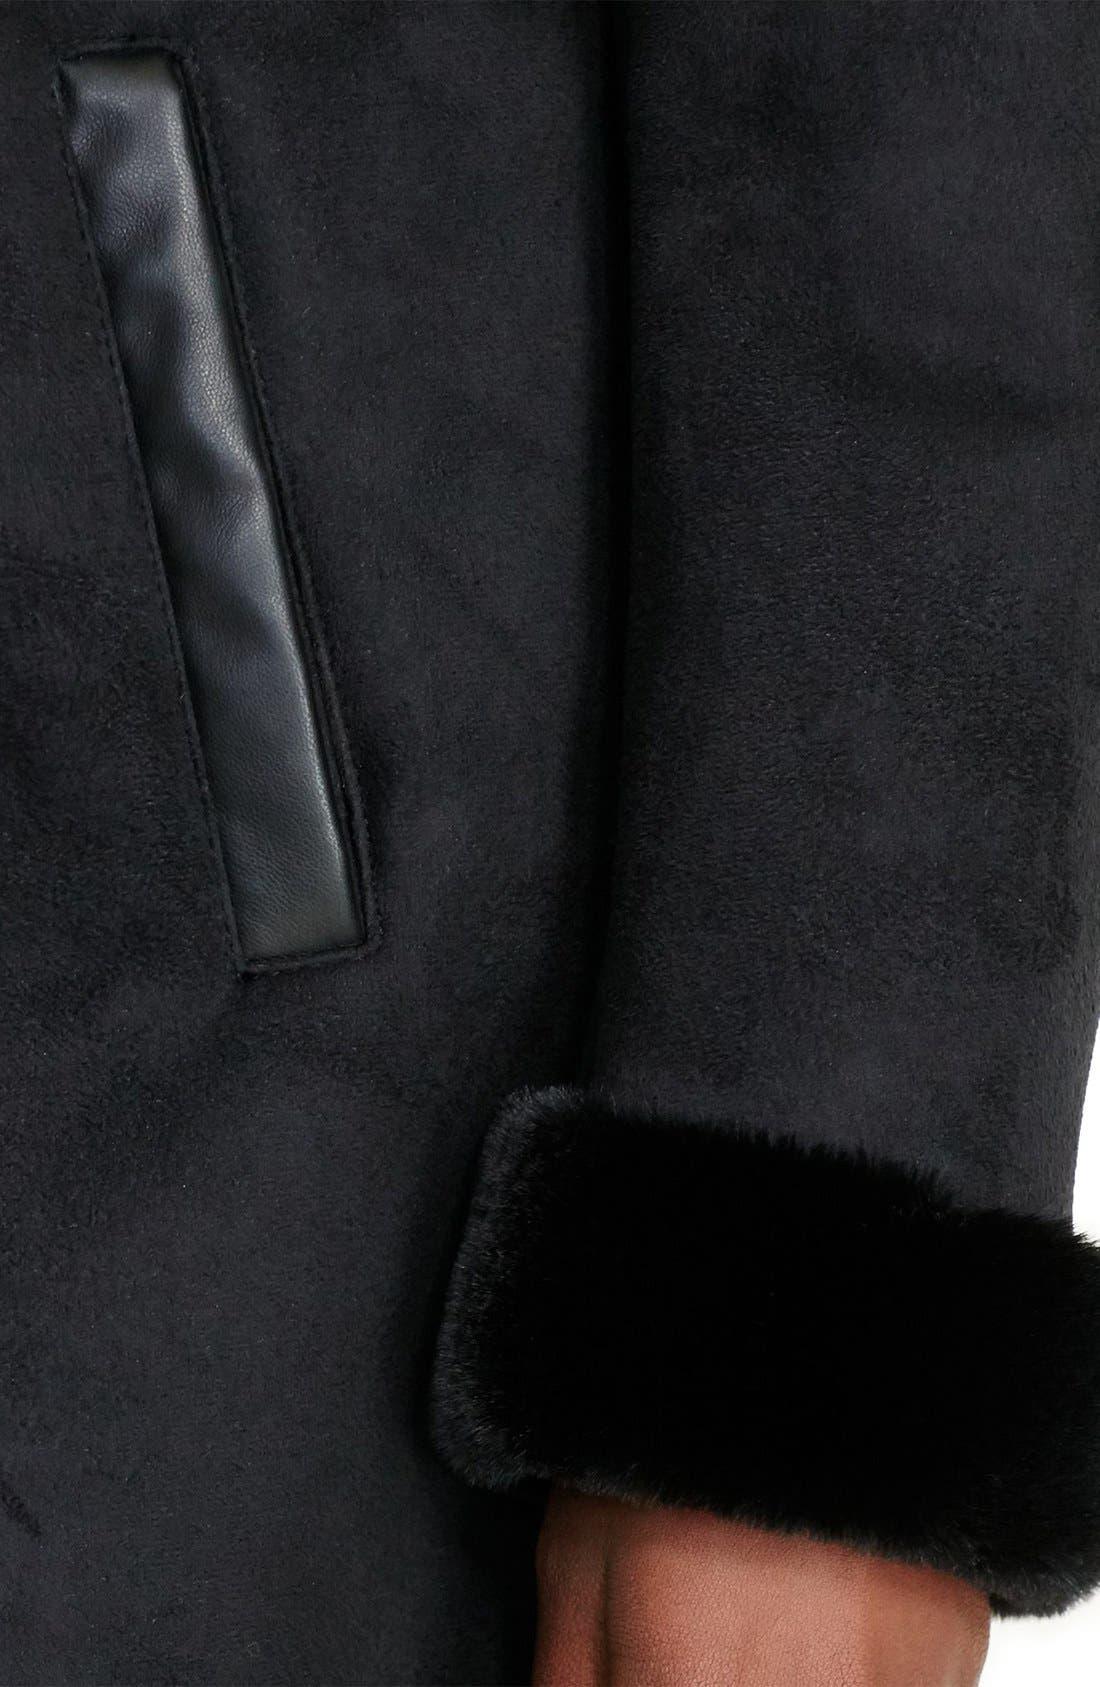 LAUREN RALPH LAUREN, Faux Shearling Coat, Alternate thumbnail 4, color, 001